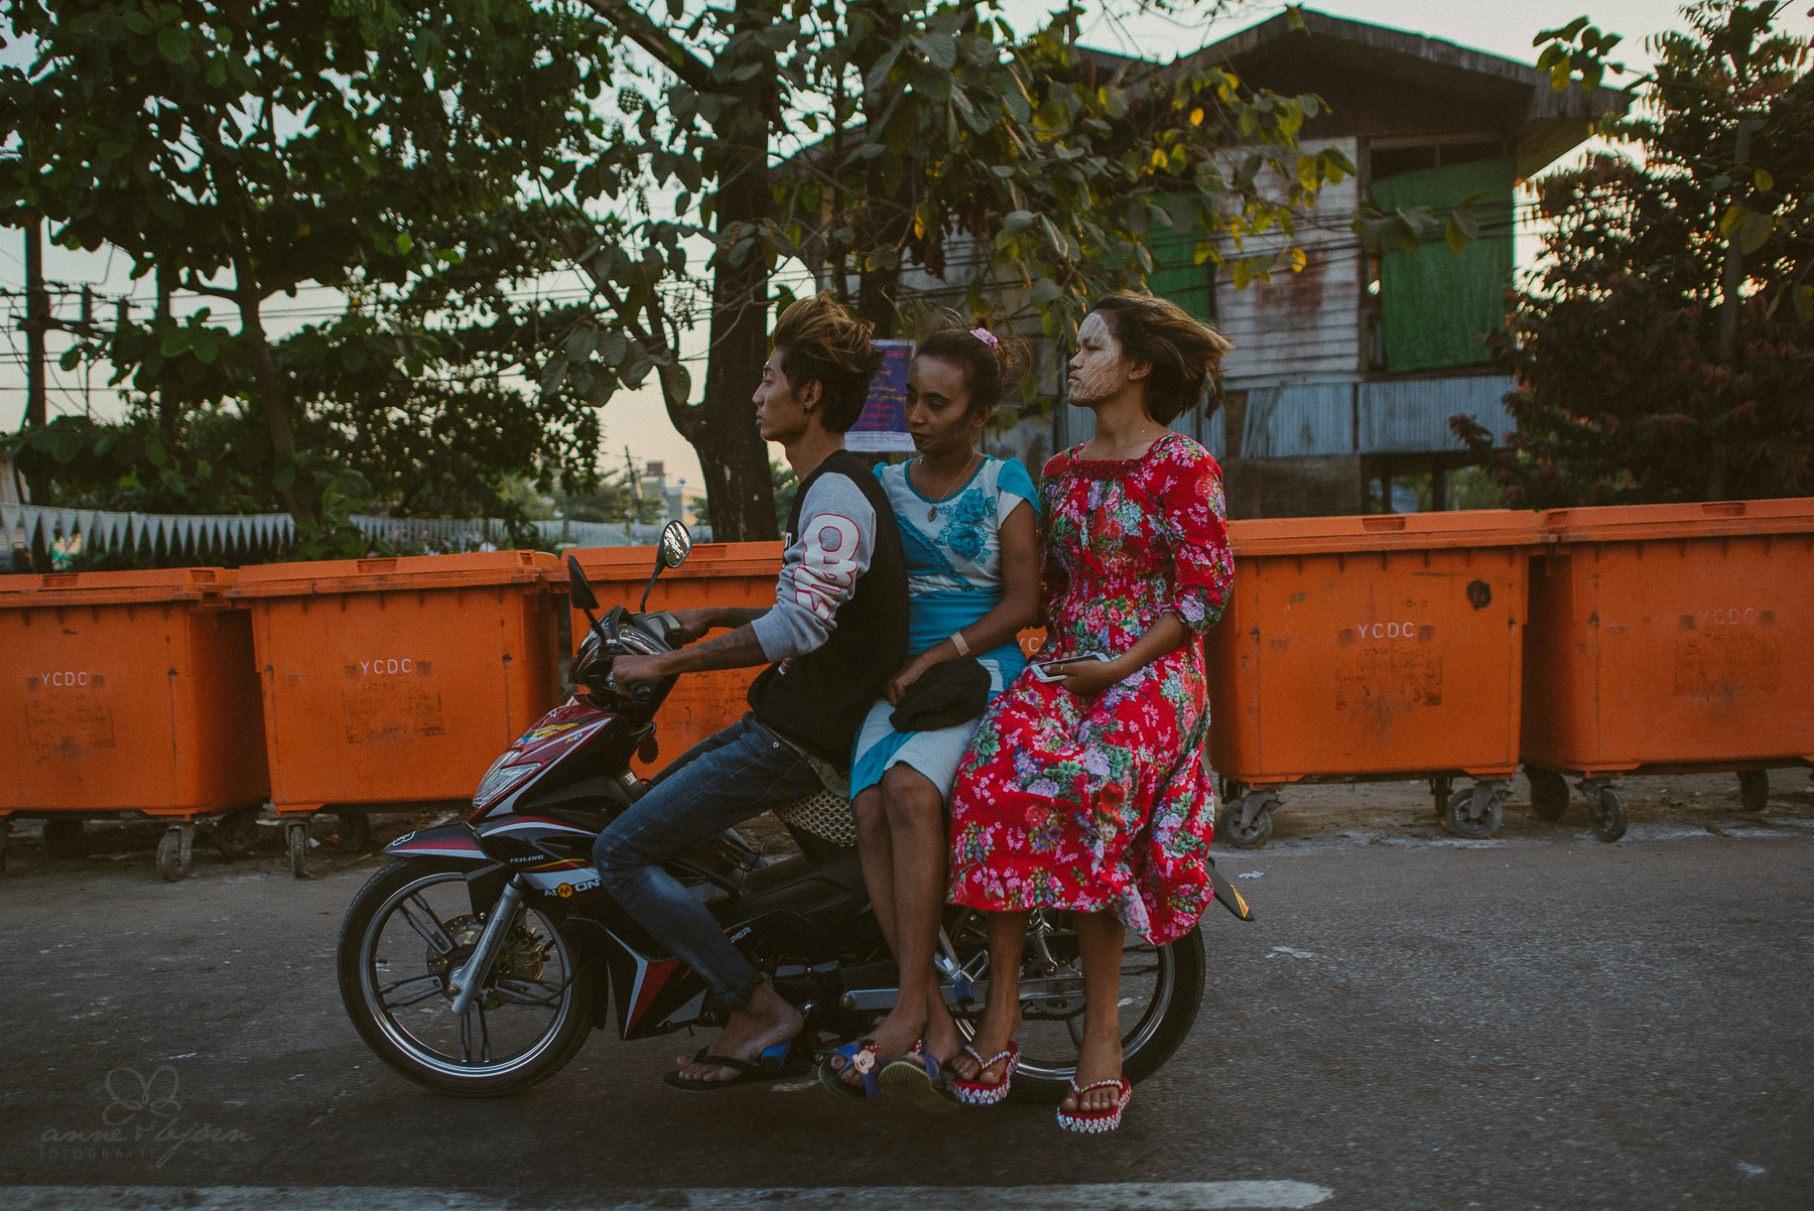 0035 yangon mandalay d76 4984 - Großstädte Myanmars - Yangon & Mandalay